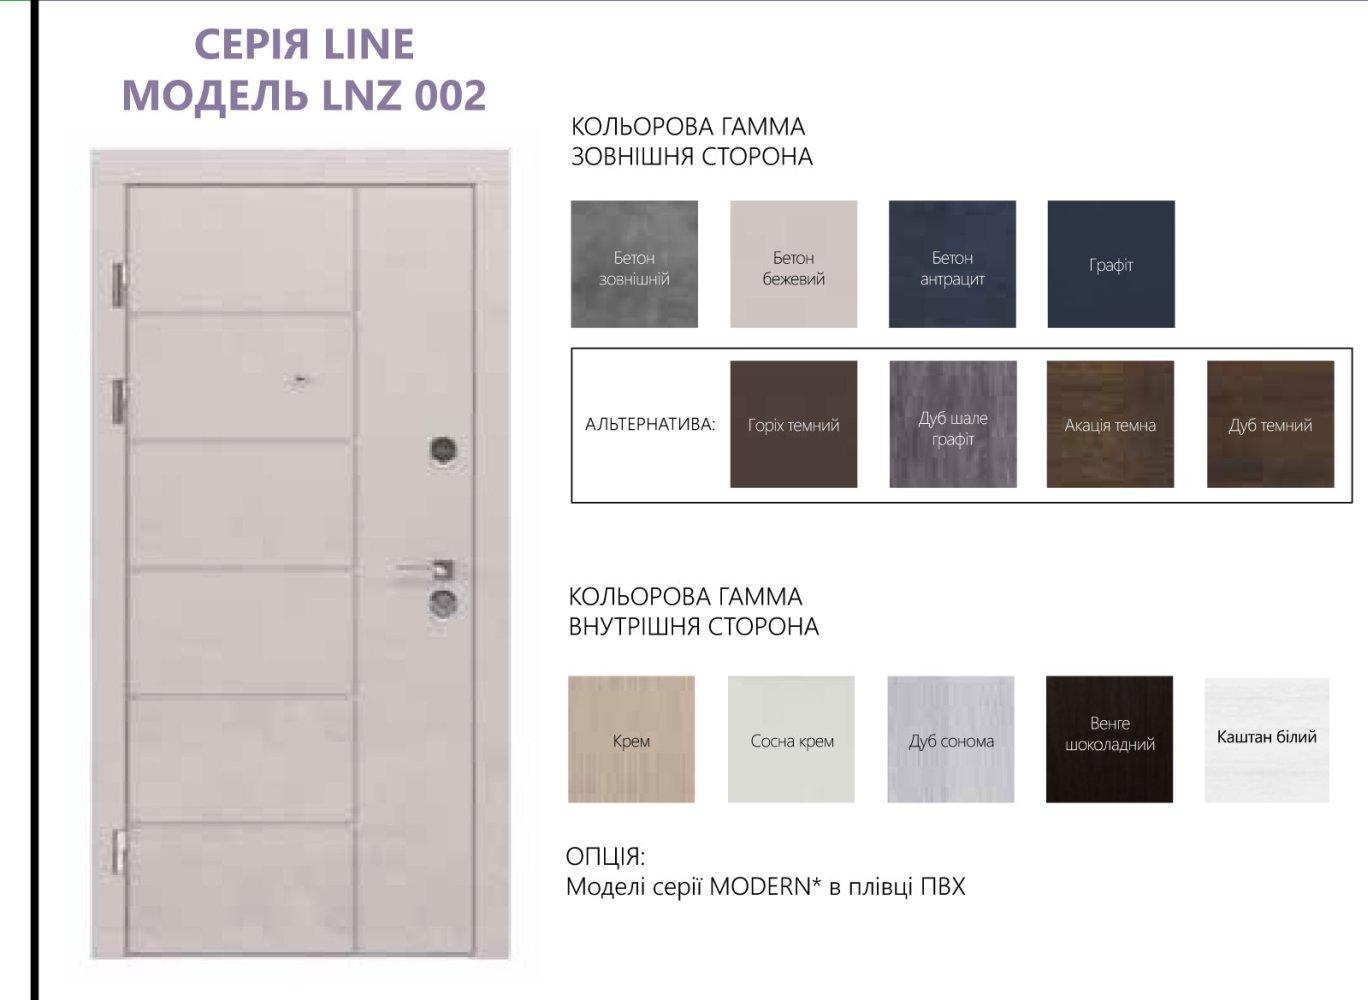 Цветовая гамма входных дверей Rodos LNZ Line LNZ 002